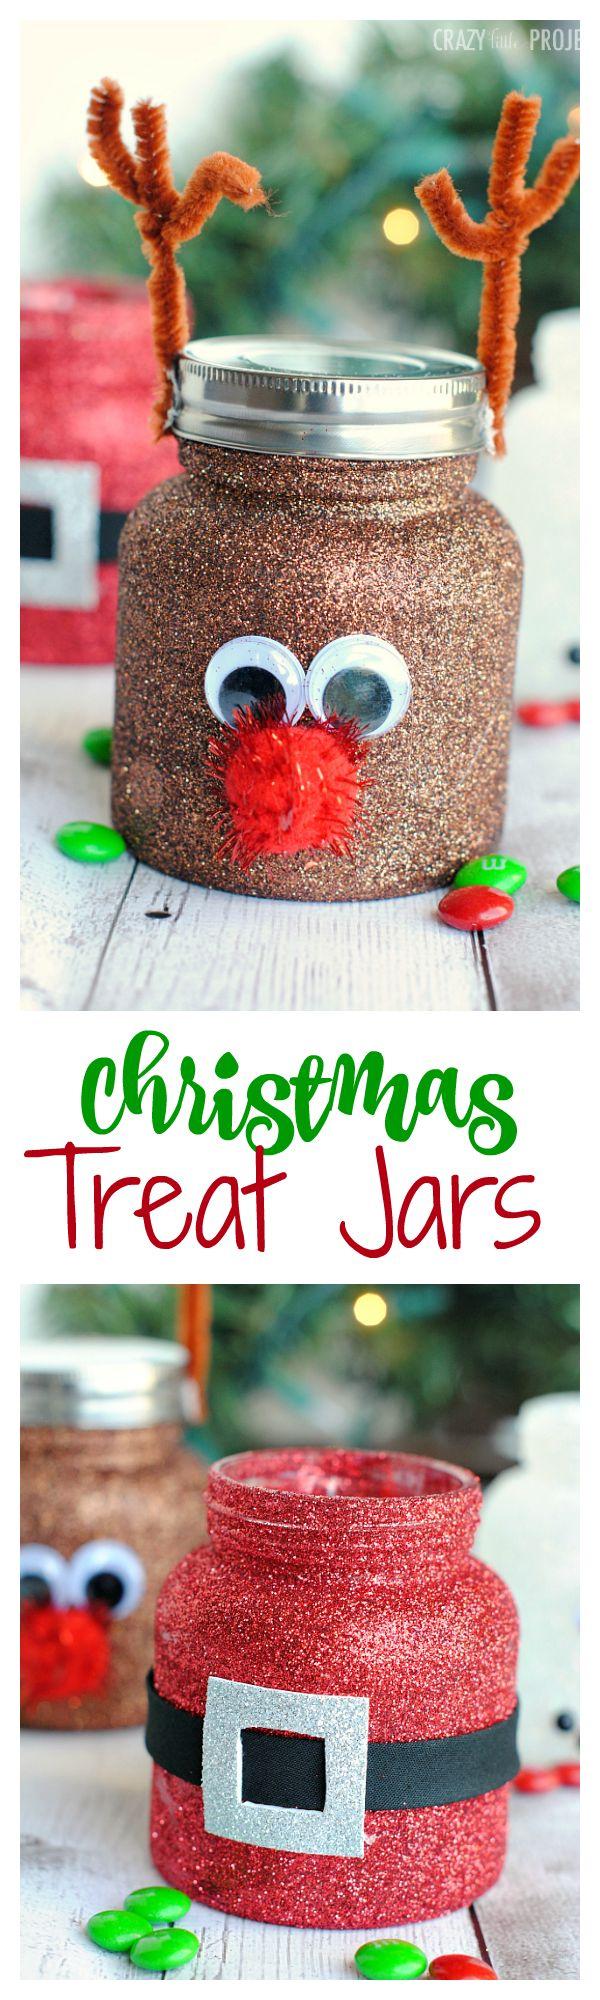 Best 309 новый год ideas on Pinterest | Christmas ornaments ...